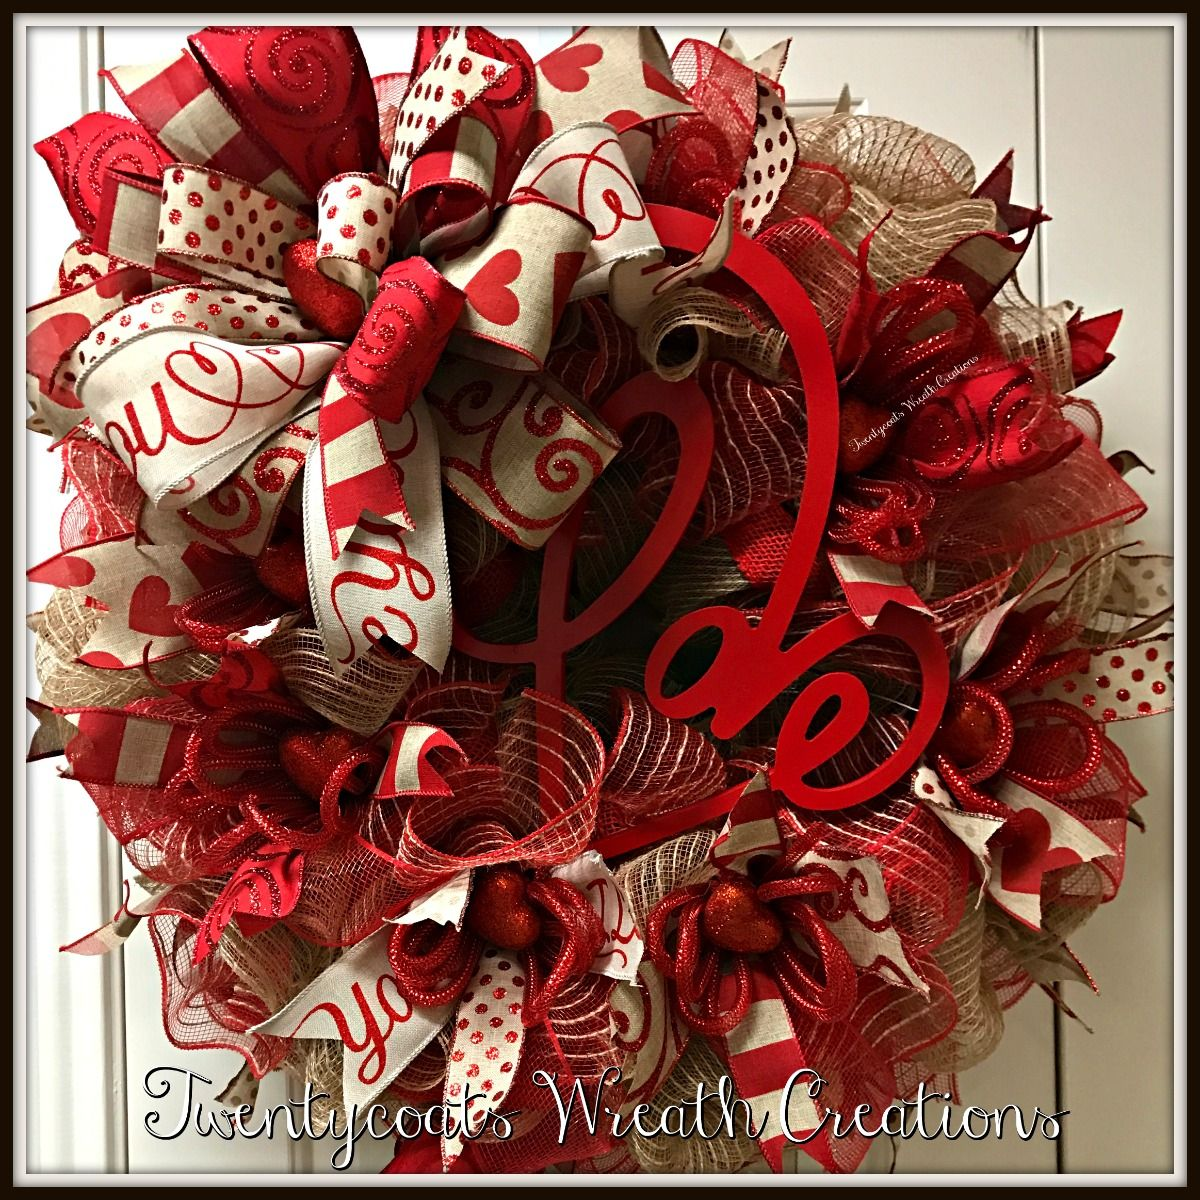 valentine 39 s day deco mesh wreath by twentycoats wreath creations 2017 trendy tree custom. Black Bedroom Furniture Sets. Home Design Ideas